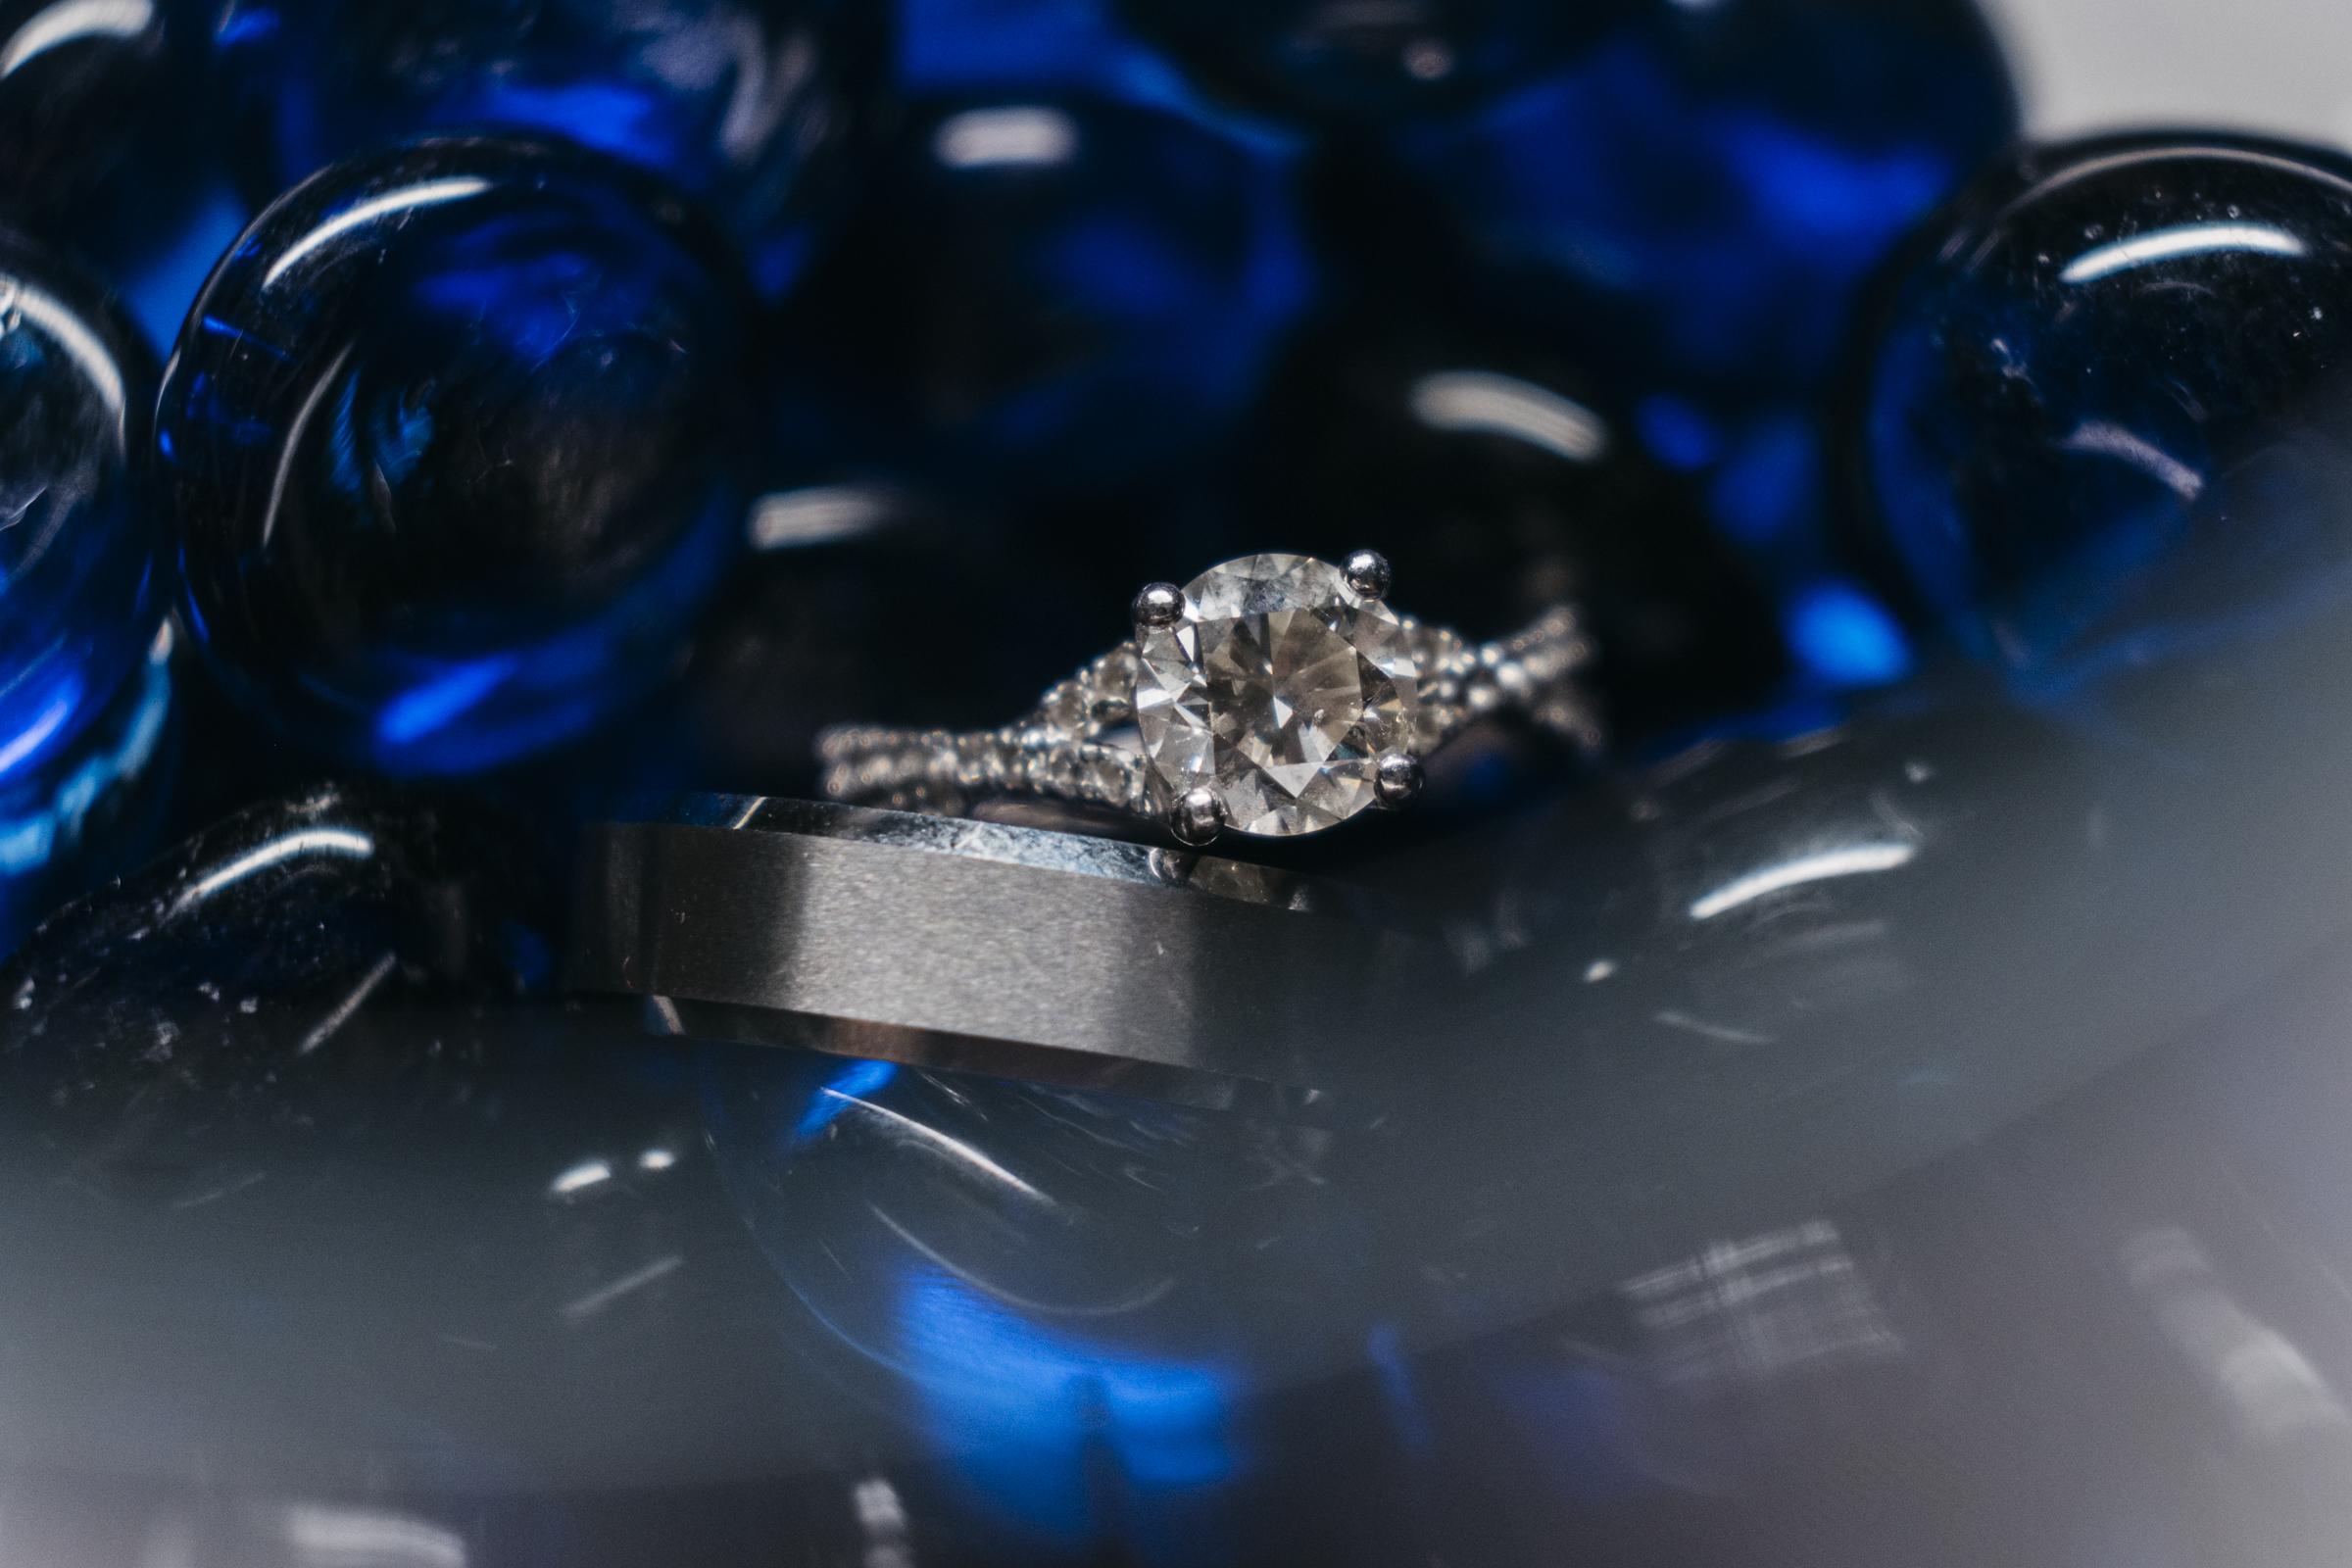 Wedding ring photo inspiration as wedding rings sit in blue beads